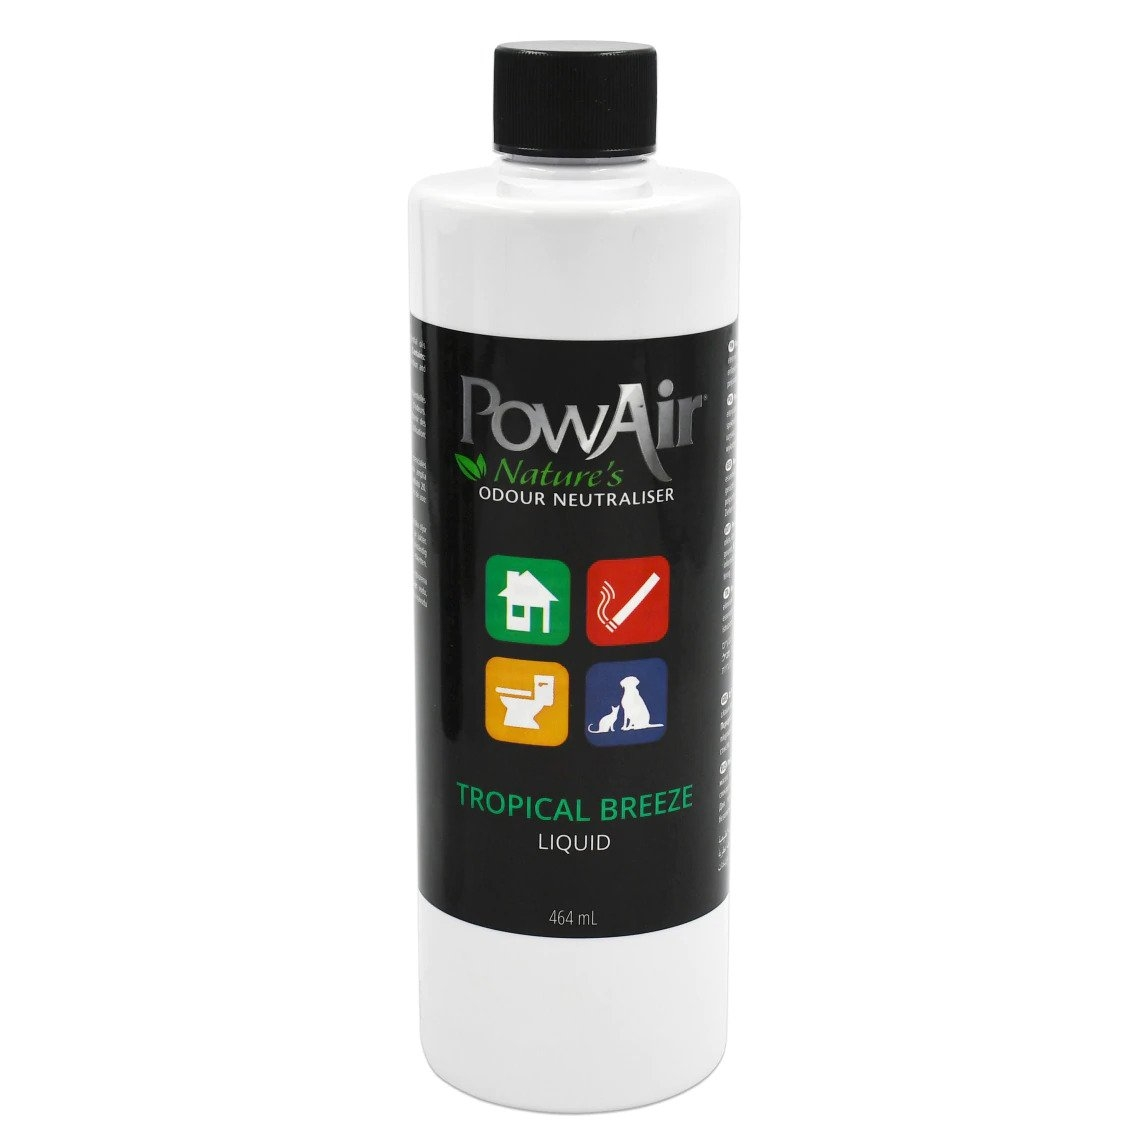 PowAir Liquid, Tropical Breeze, 464ml imagine